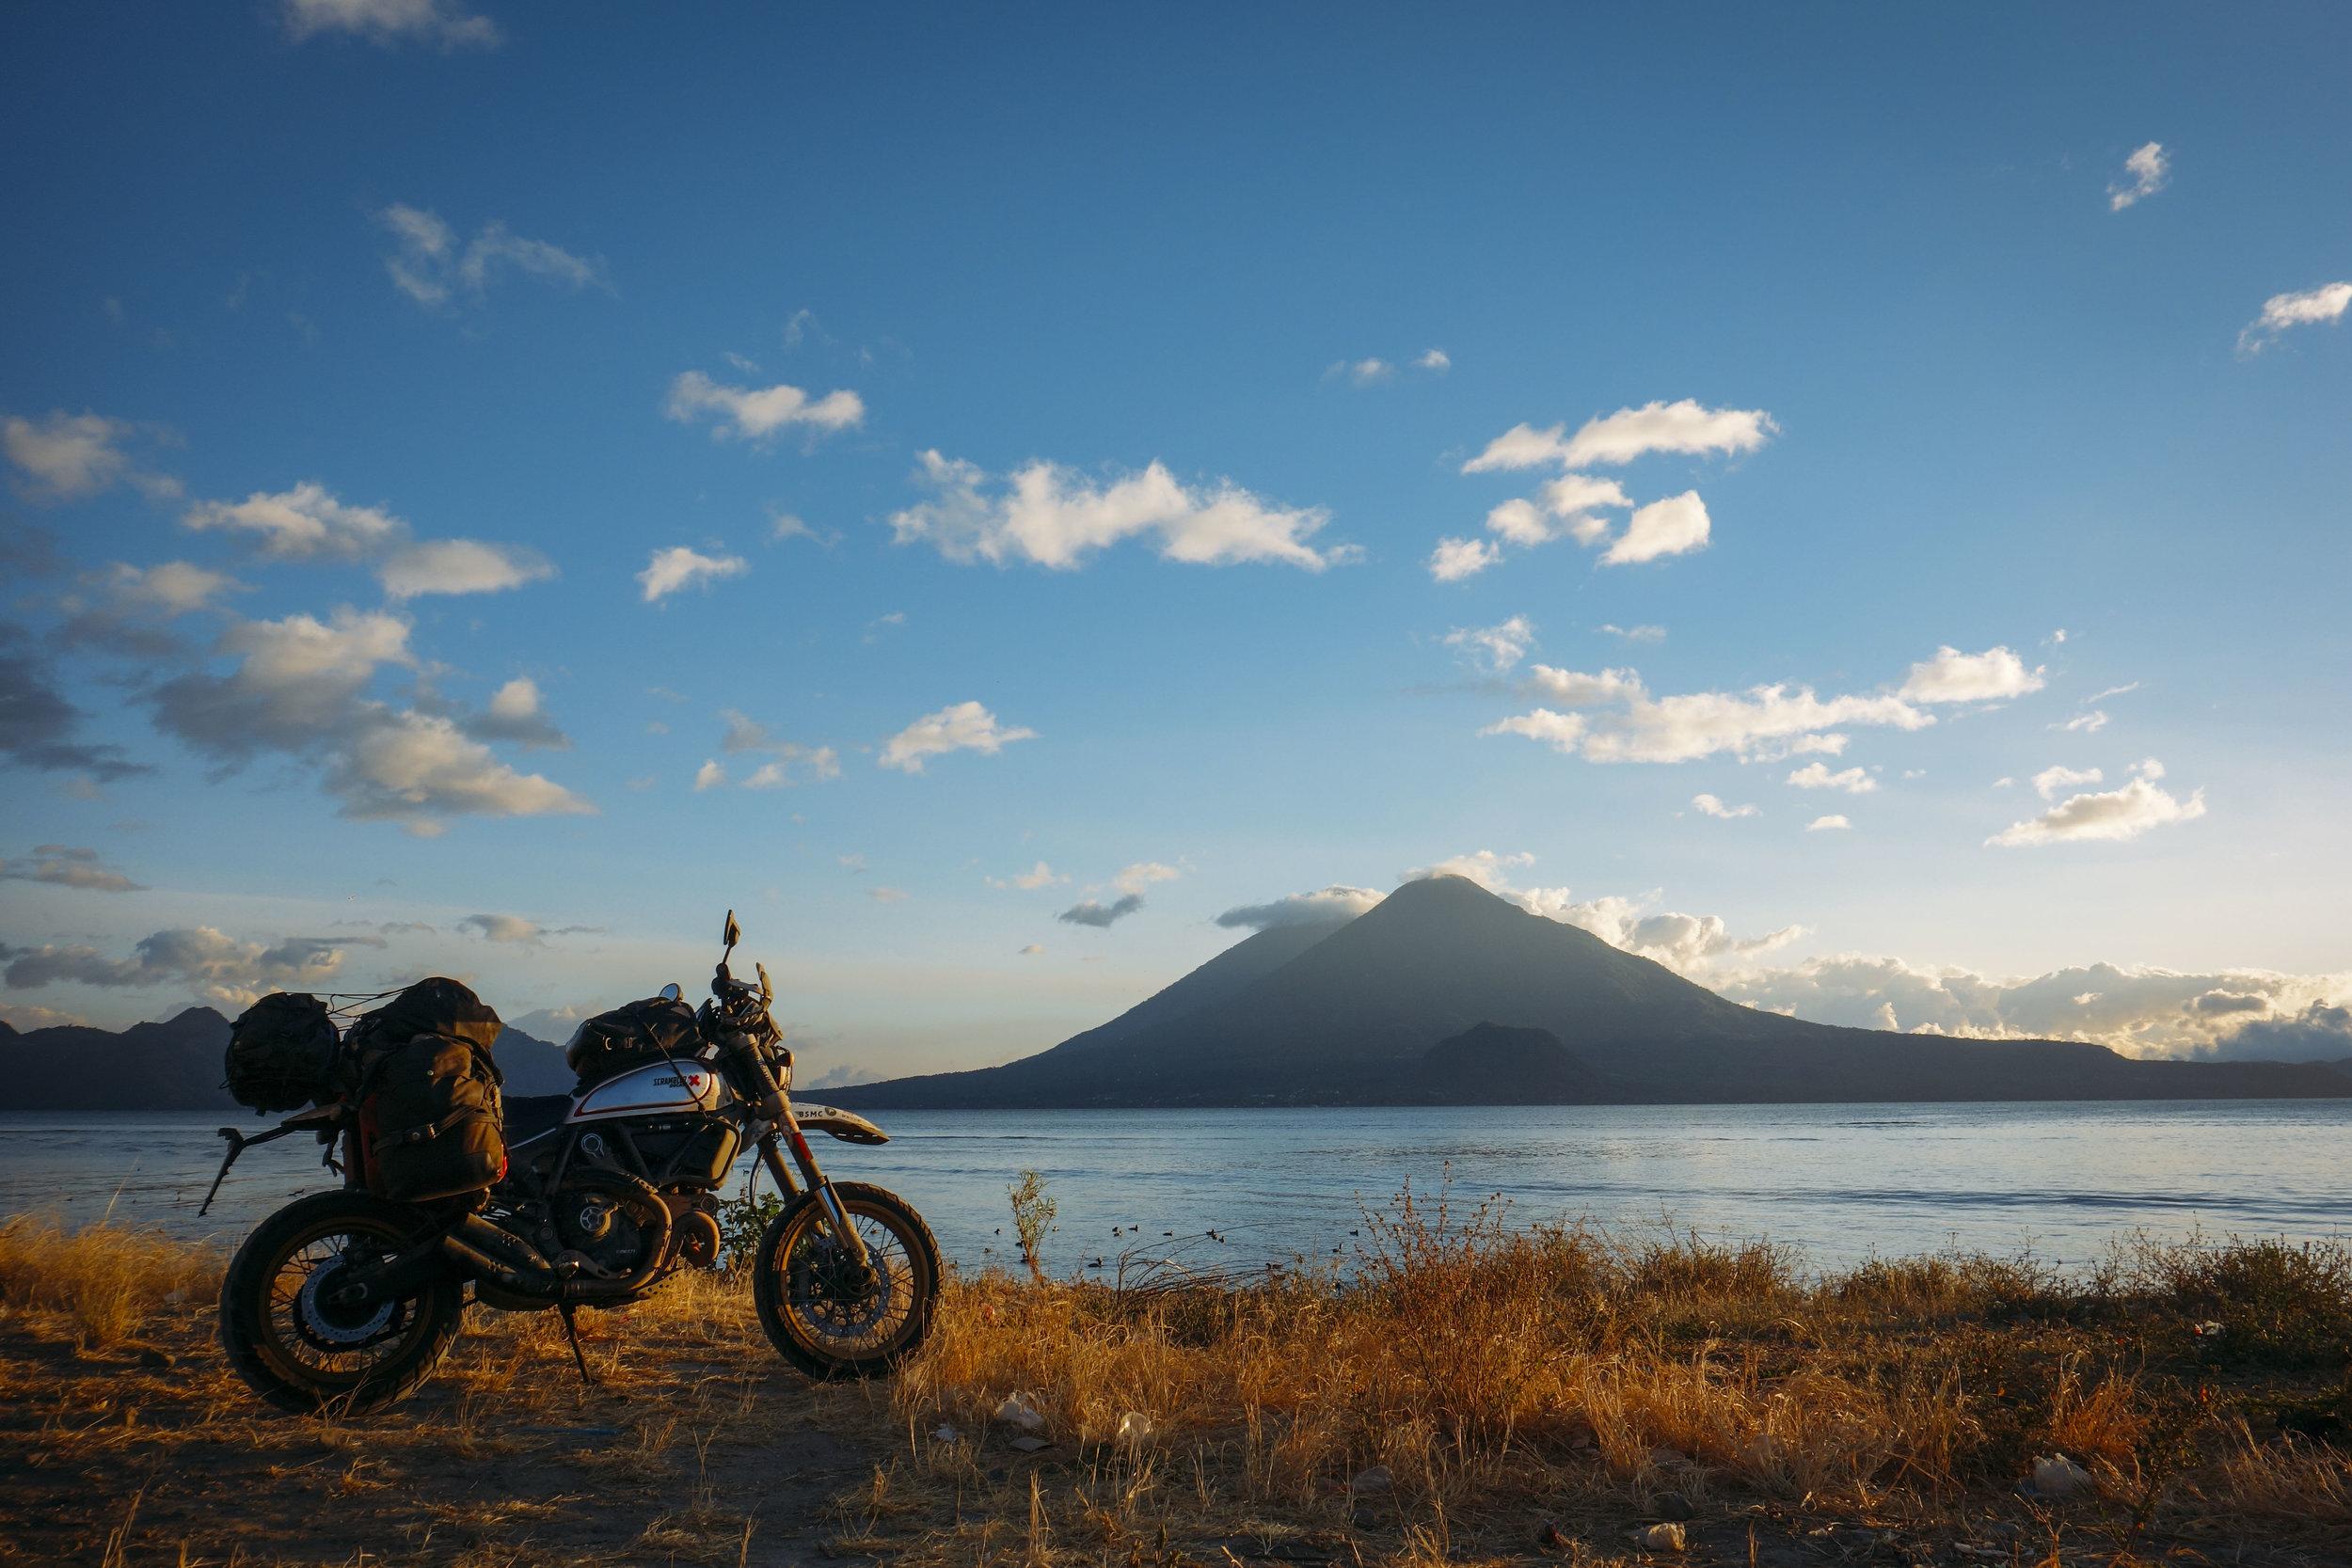 Lake Atitlan Gautemala 1st edits_8.jpg